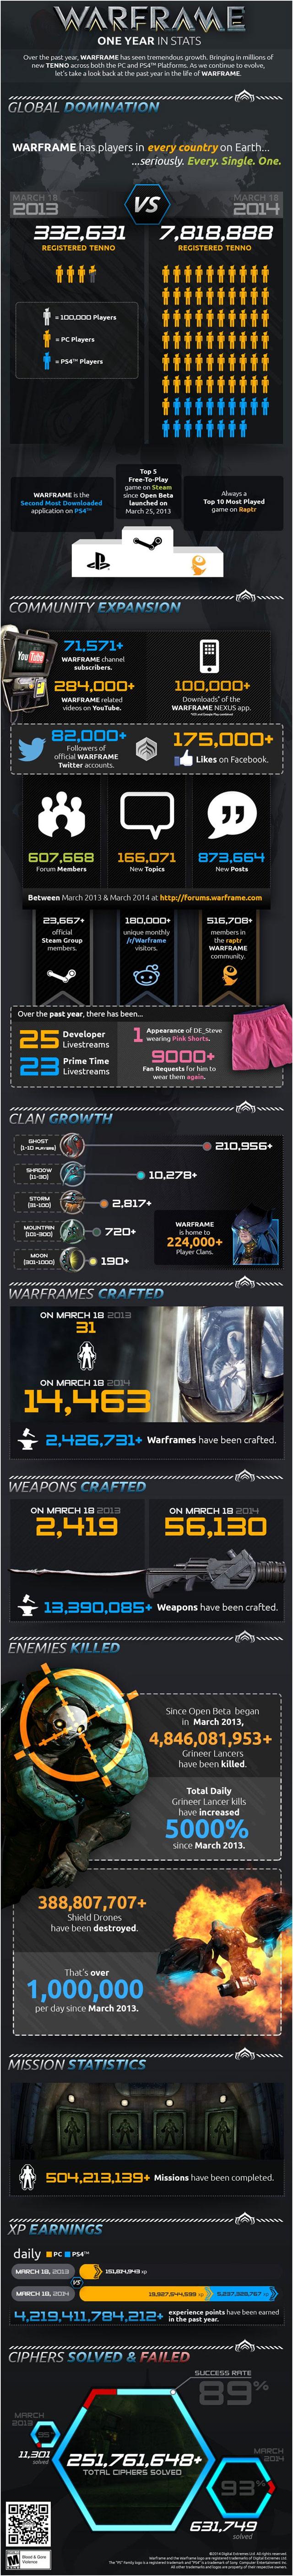 warframe_infogra